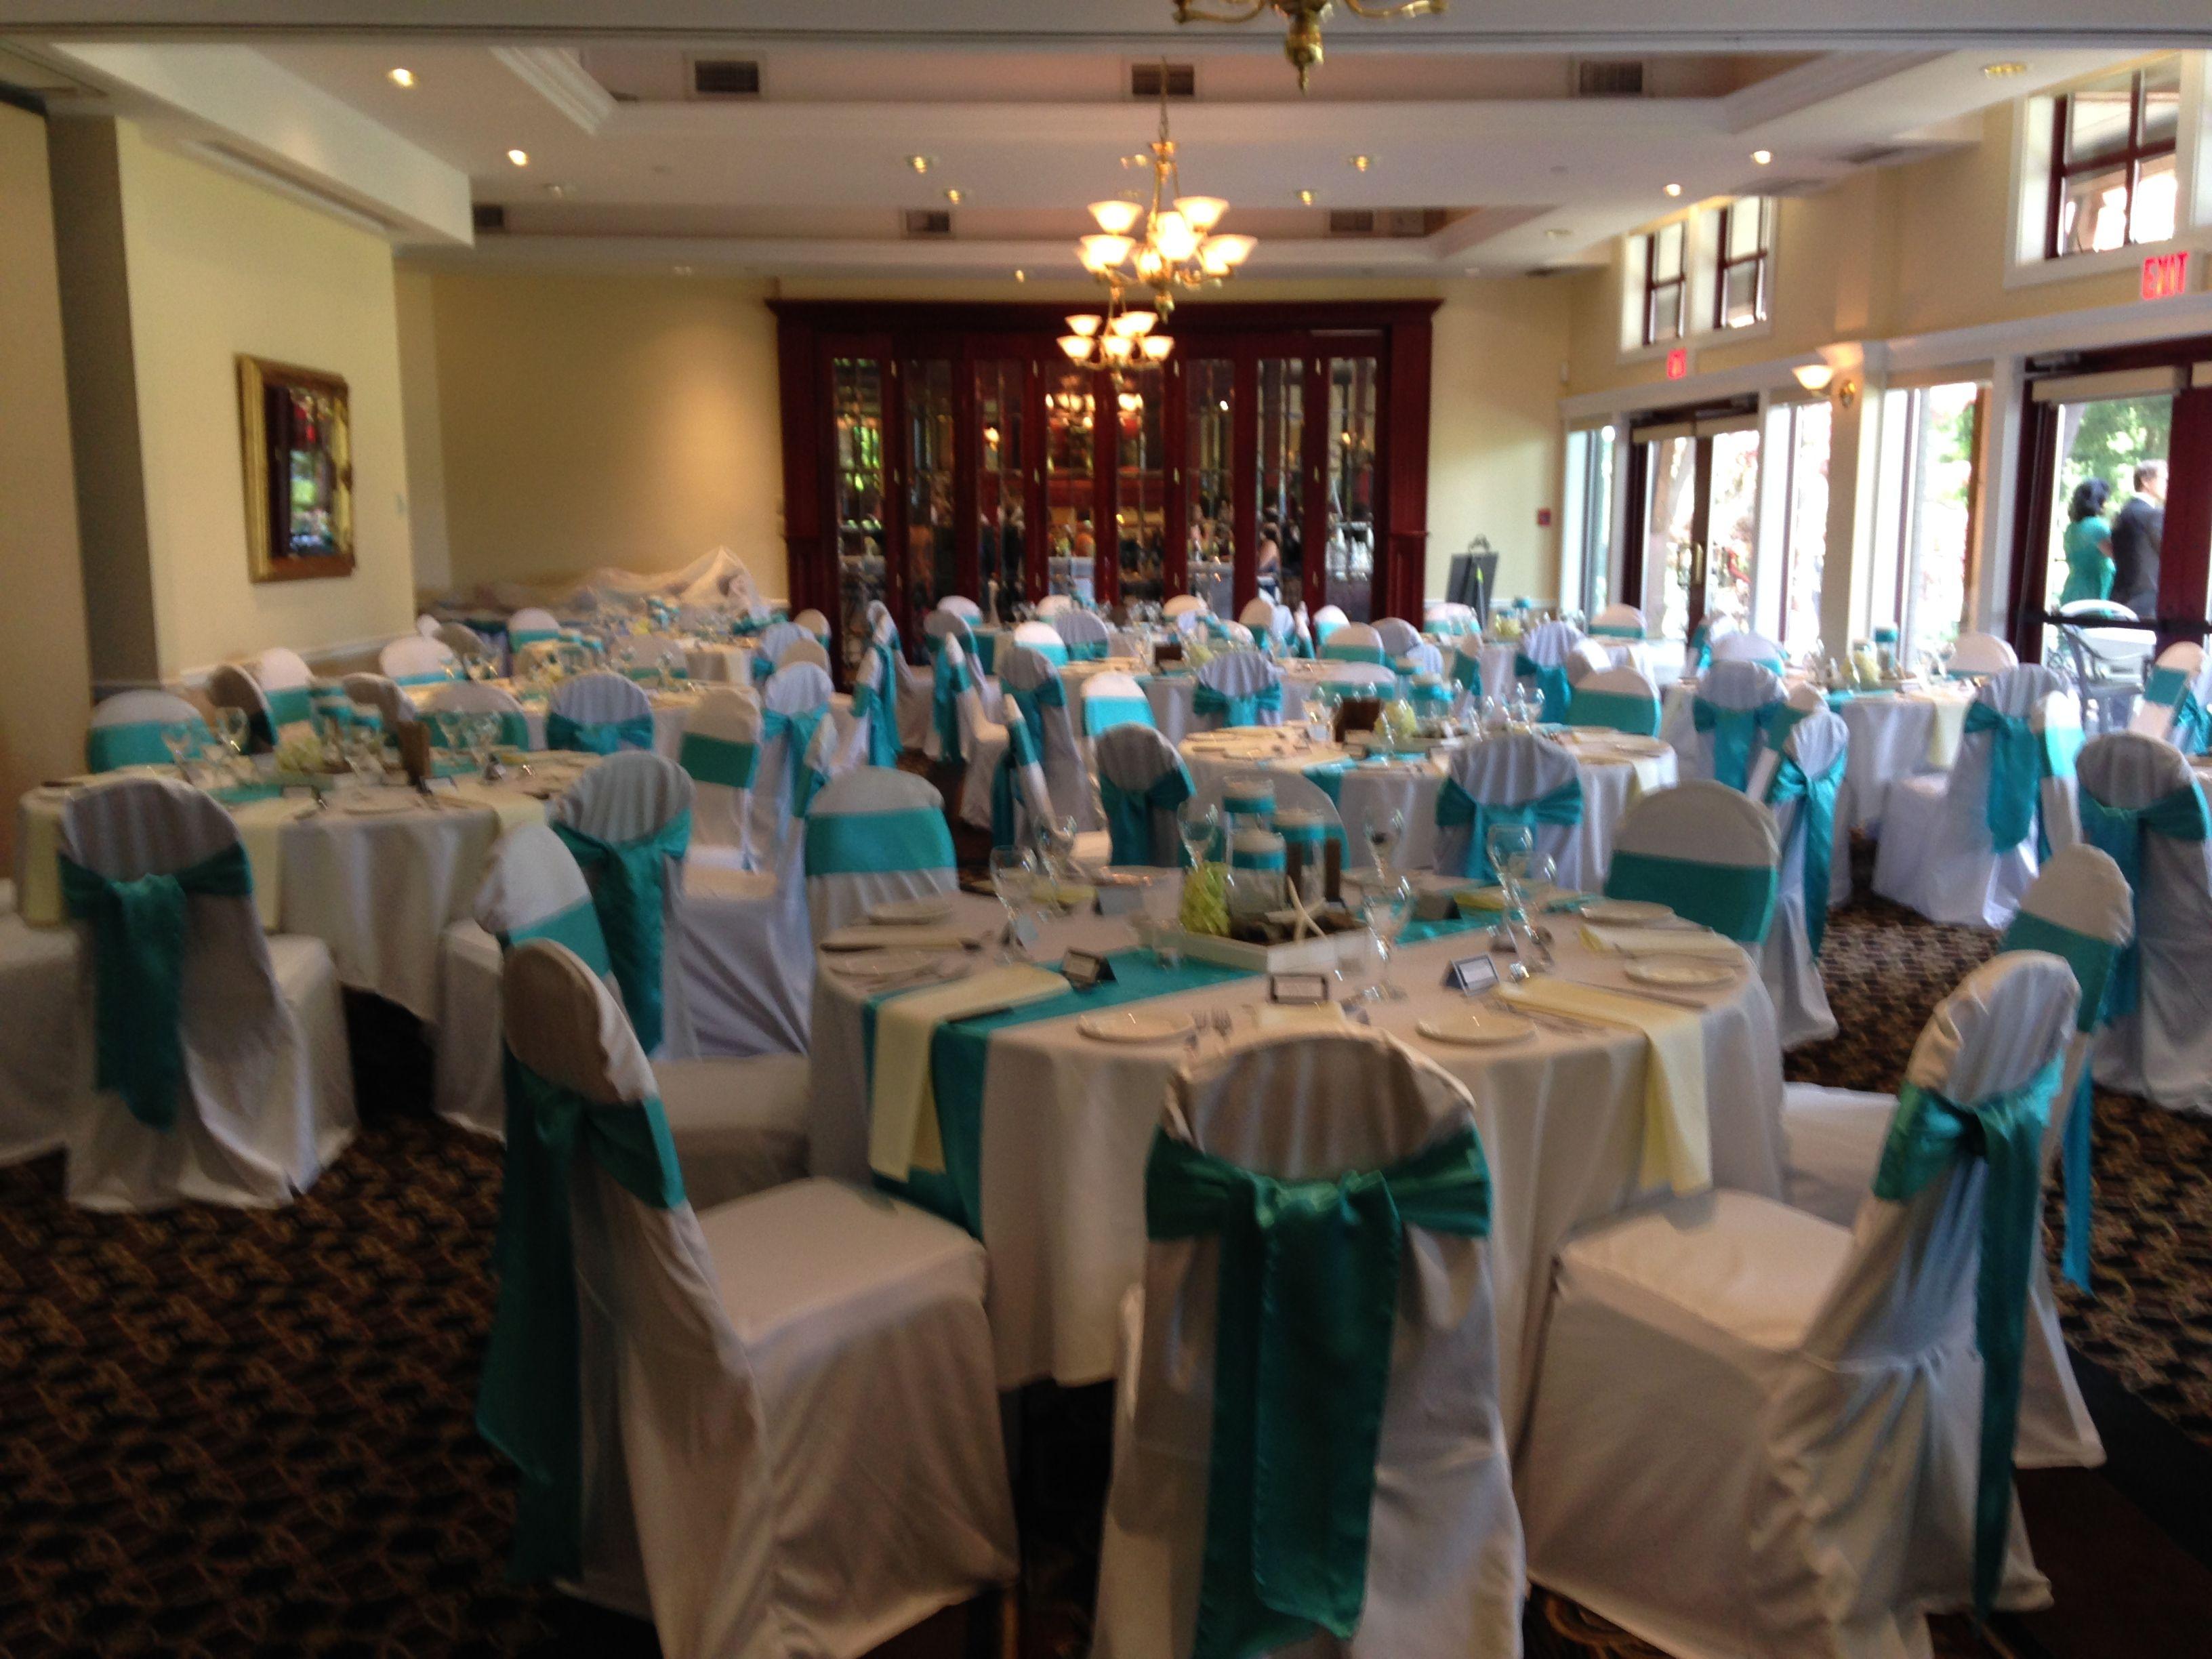 Annie Spencer June 2014 Reception At Crown Isle Golf Resort Courtenay Comox Vancouver Island Nanaimo Venues Wed Wedding Rentals Beach Themes Decor